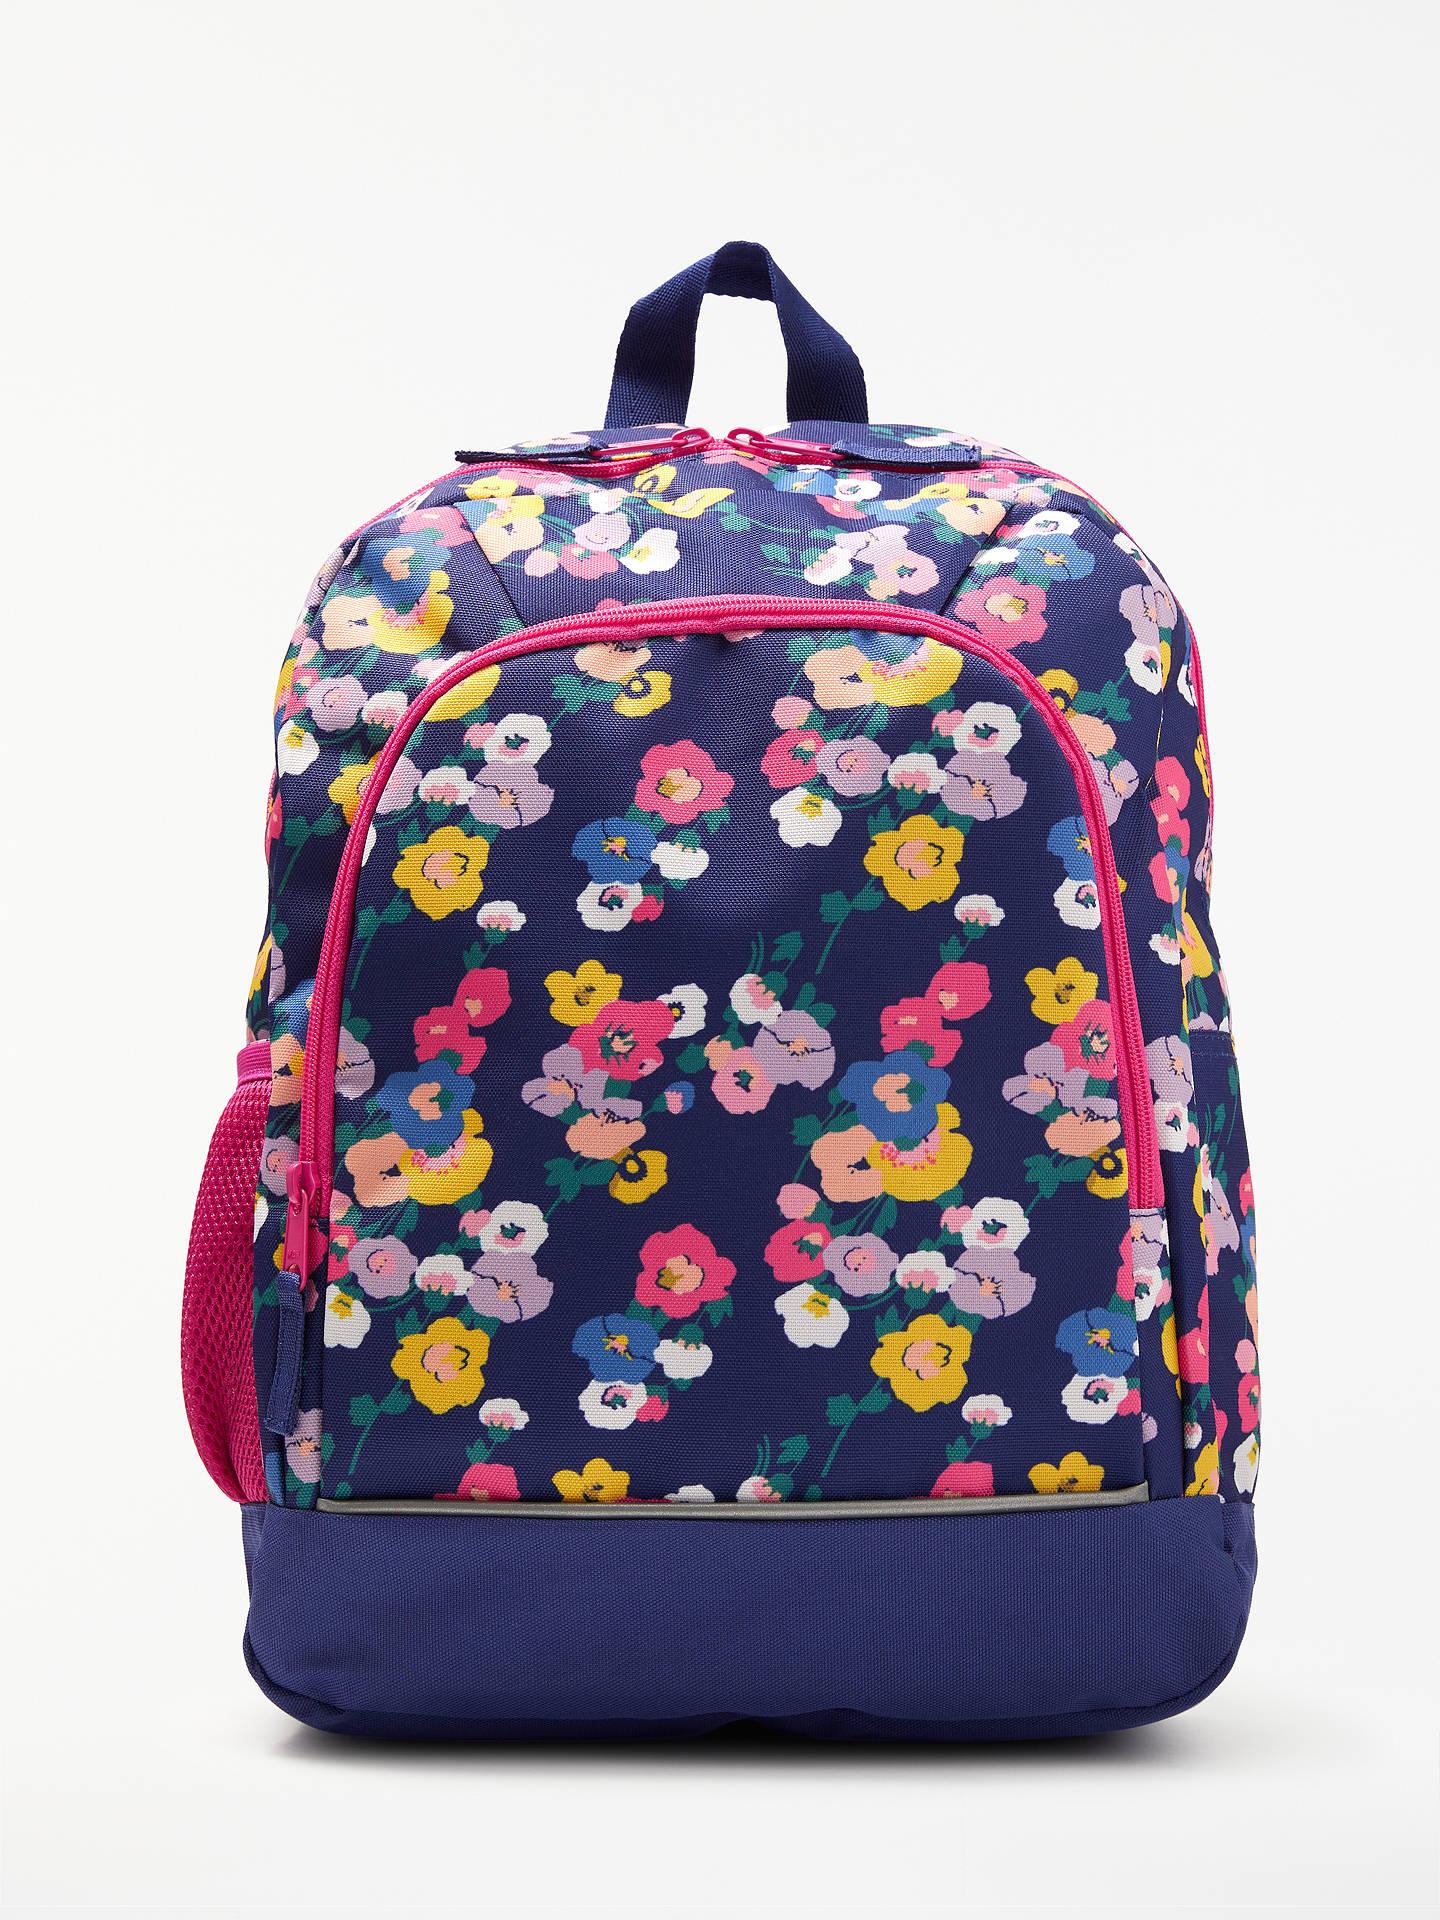 b31f8b86cc Buy John Lewis & Partners Children's Floral Print Backpack, NavyMulti  Online at johnlewis. ...